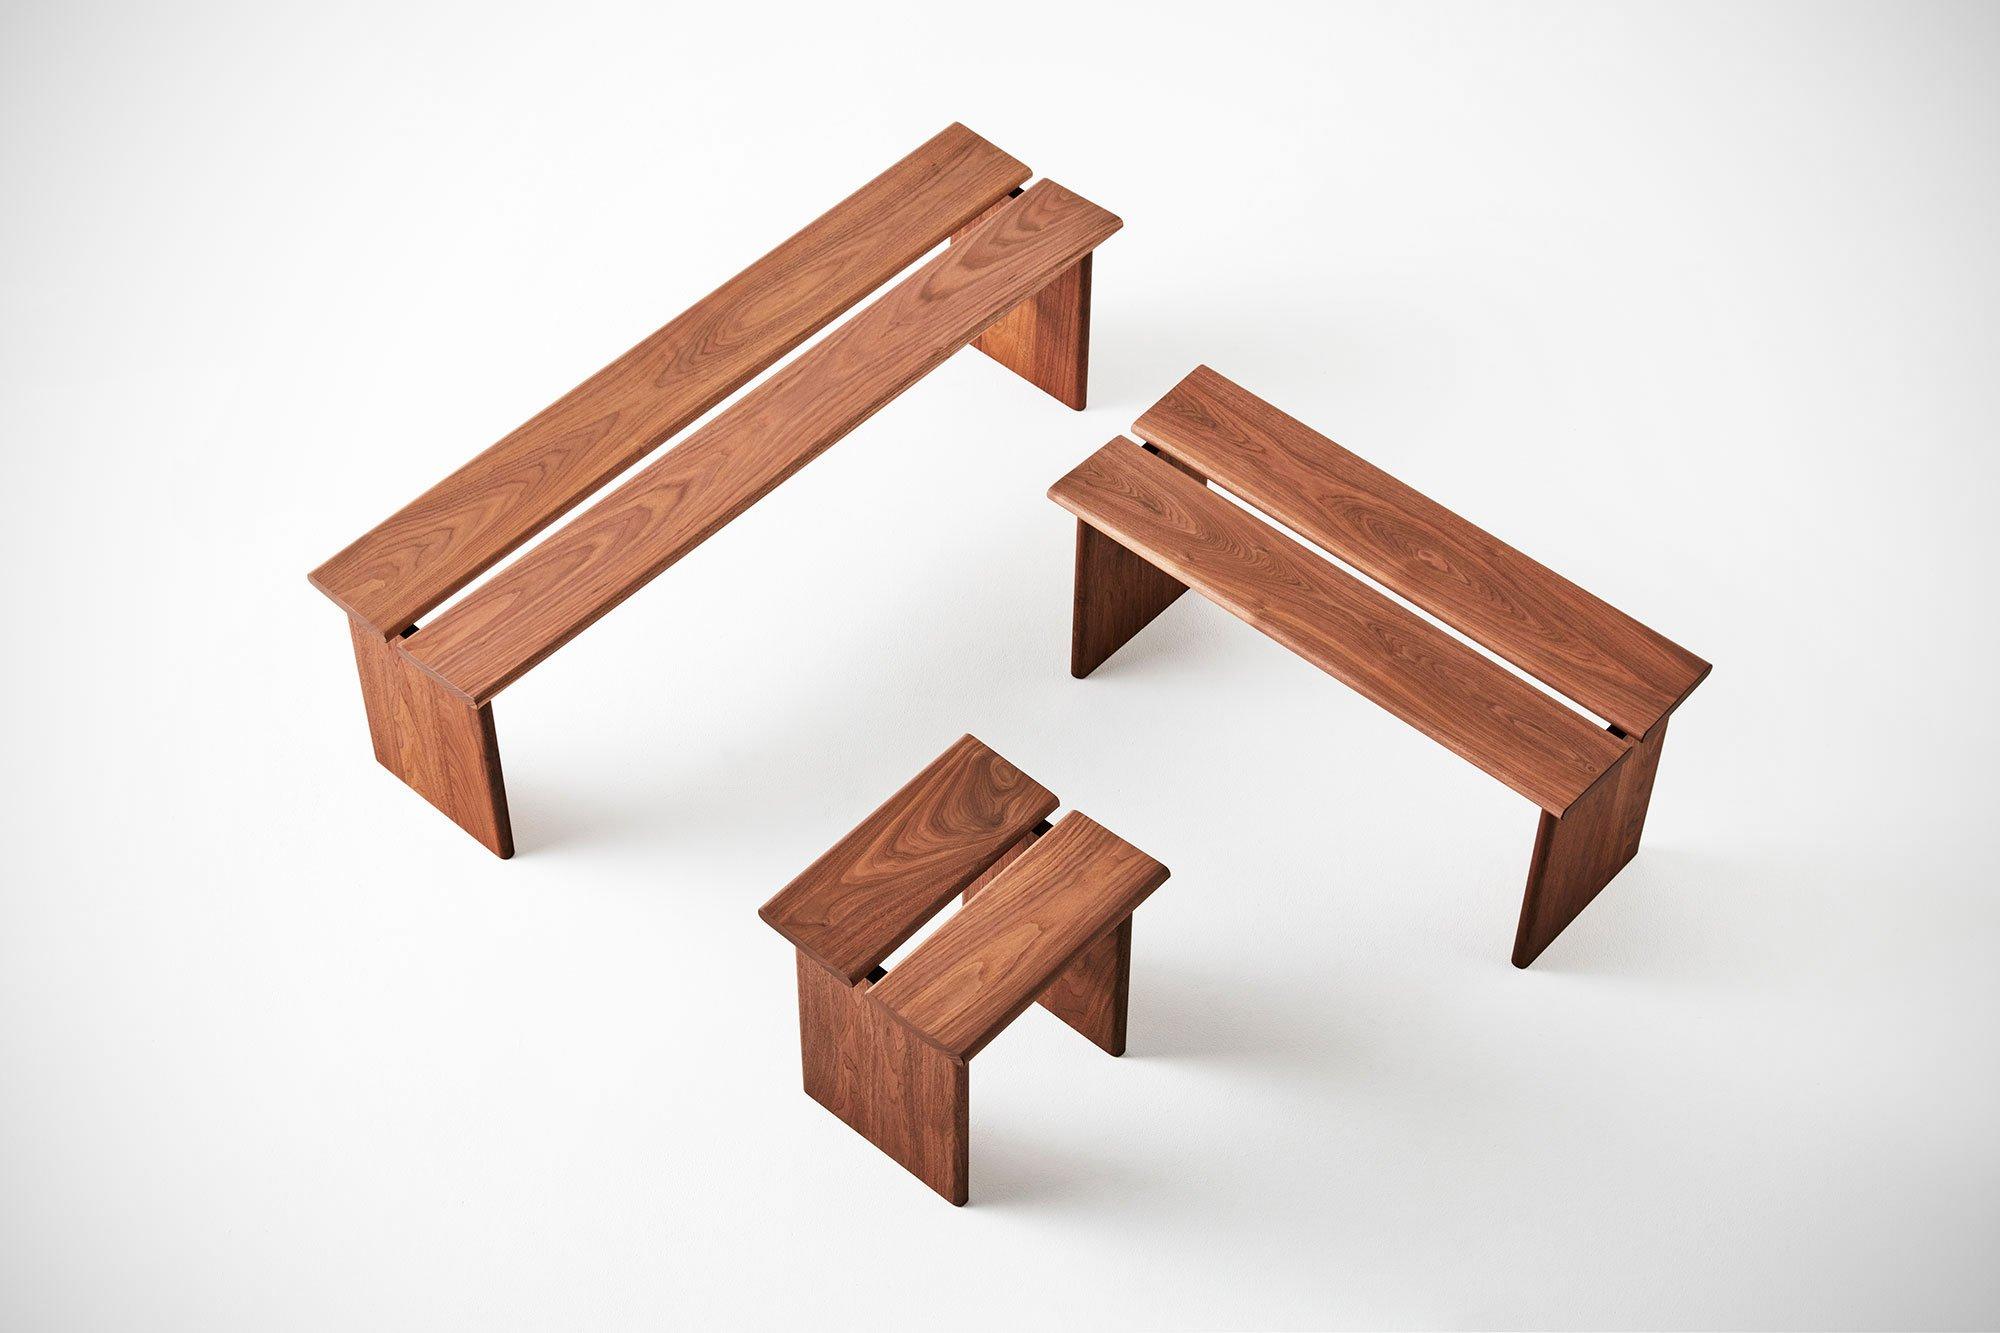 Minimal furniture design the yu range designed by mikiya for Minimal furniture design